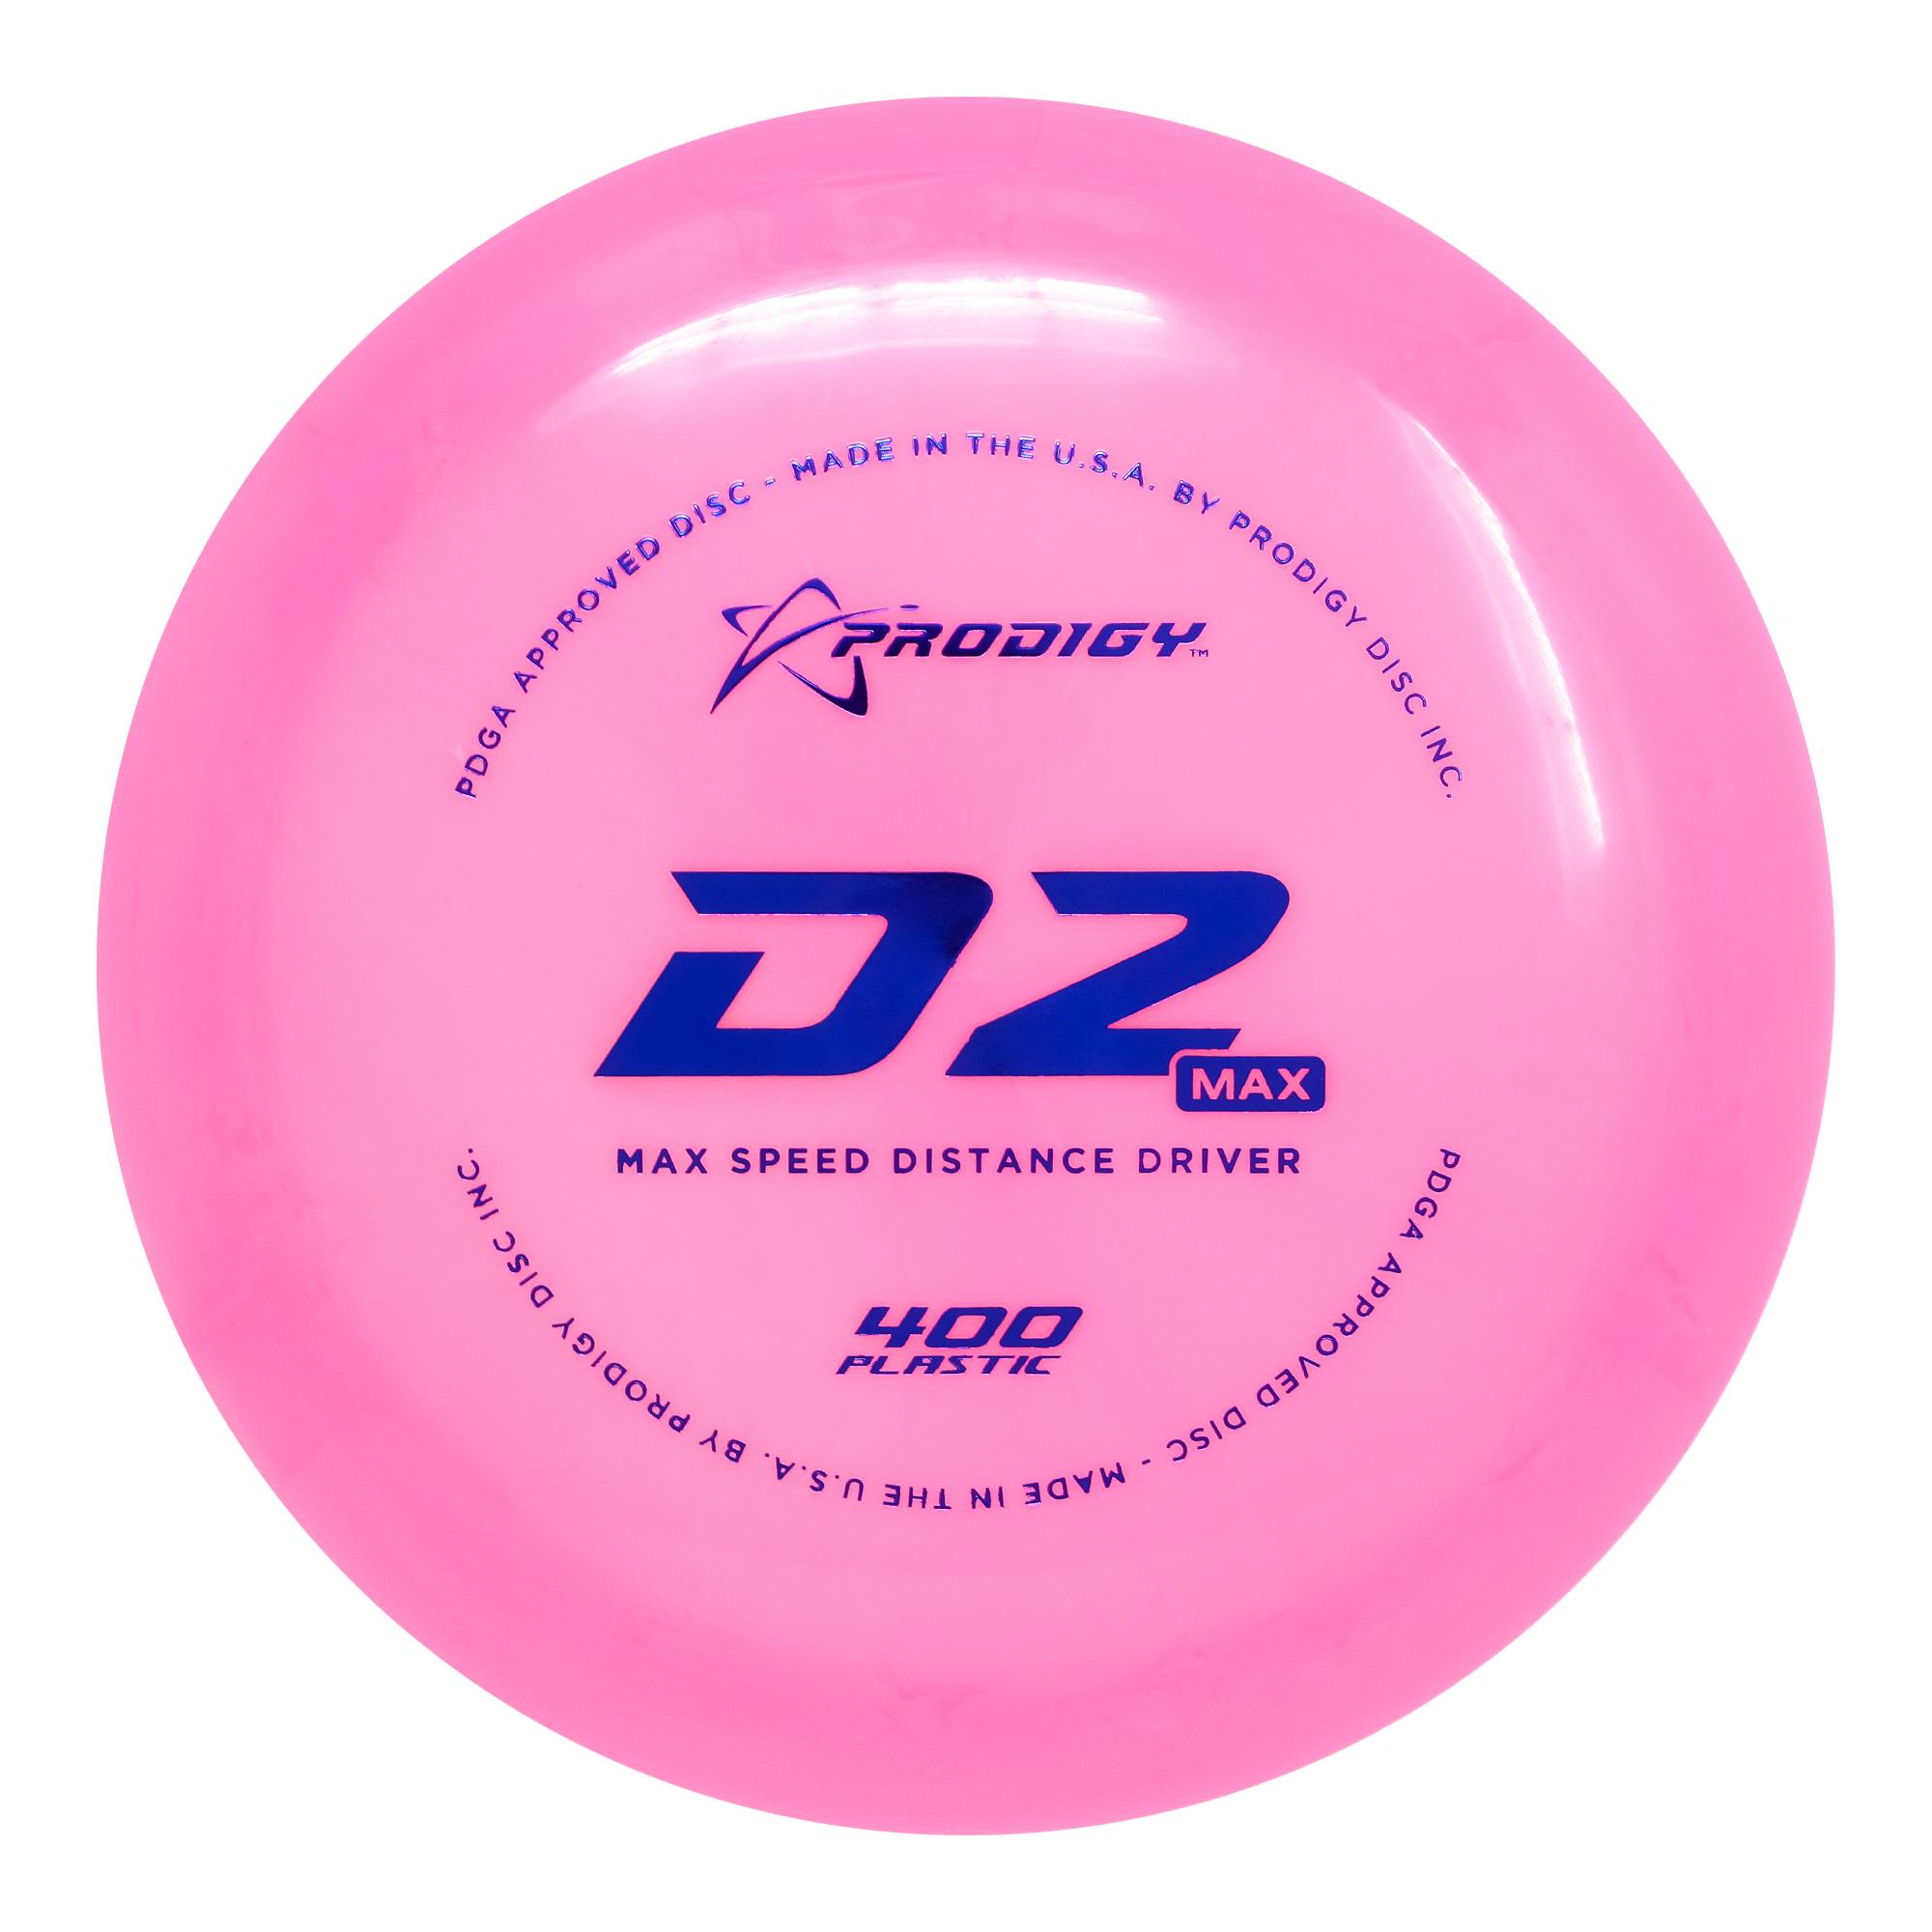 prodigy_D2_max_400_pink_thumbnail.jpg